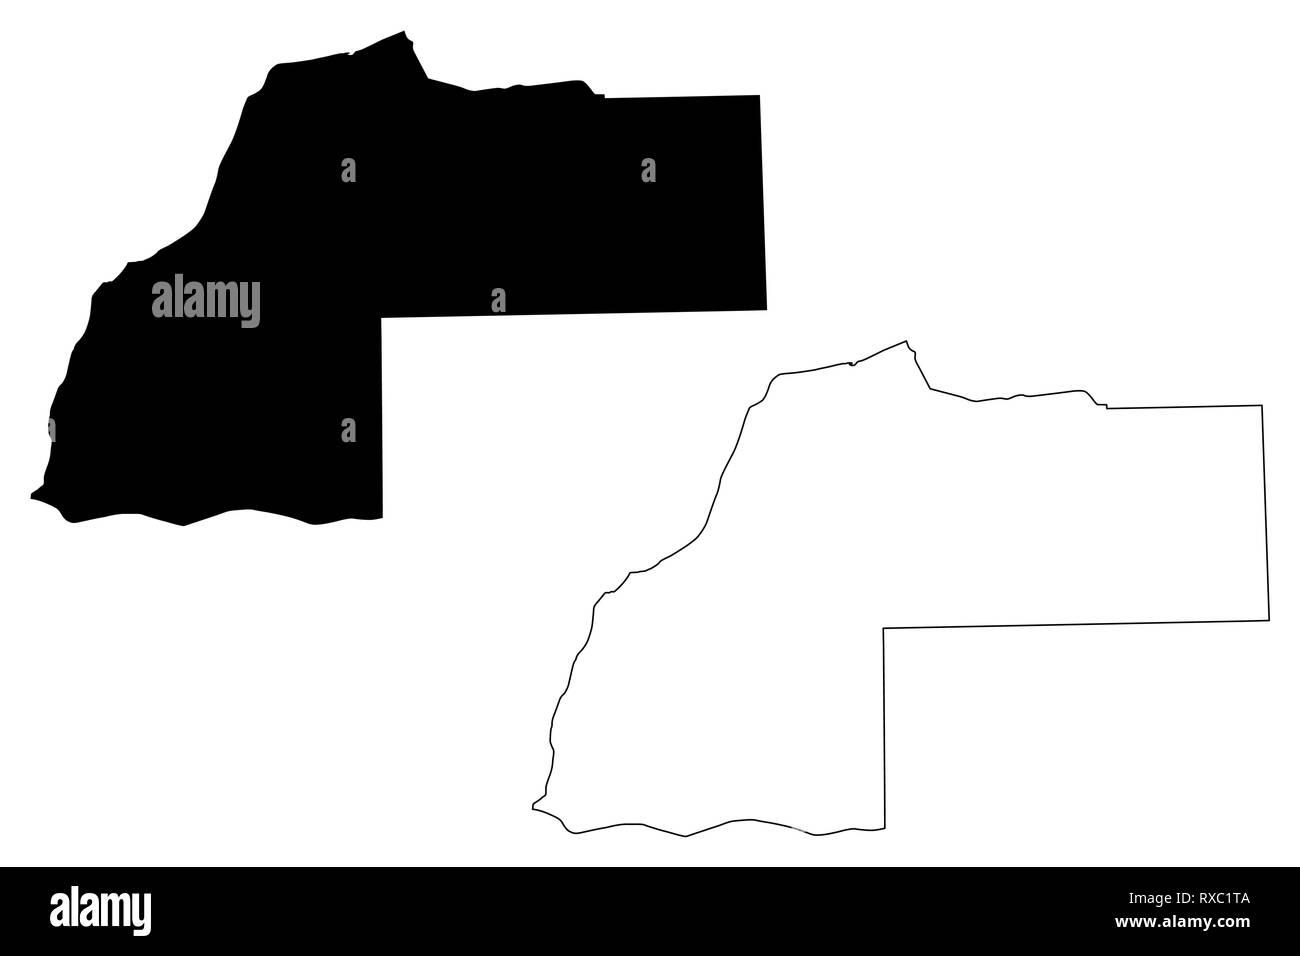 Laayoune-Sakia El Hamra Region (Administrative divisions of Morocco, Kingdom of Morocco, Regions of Morocco) map vector illustration, scribble sketch  - Stock Image